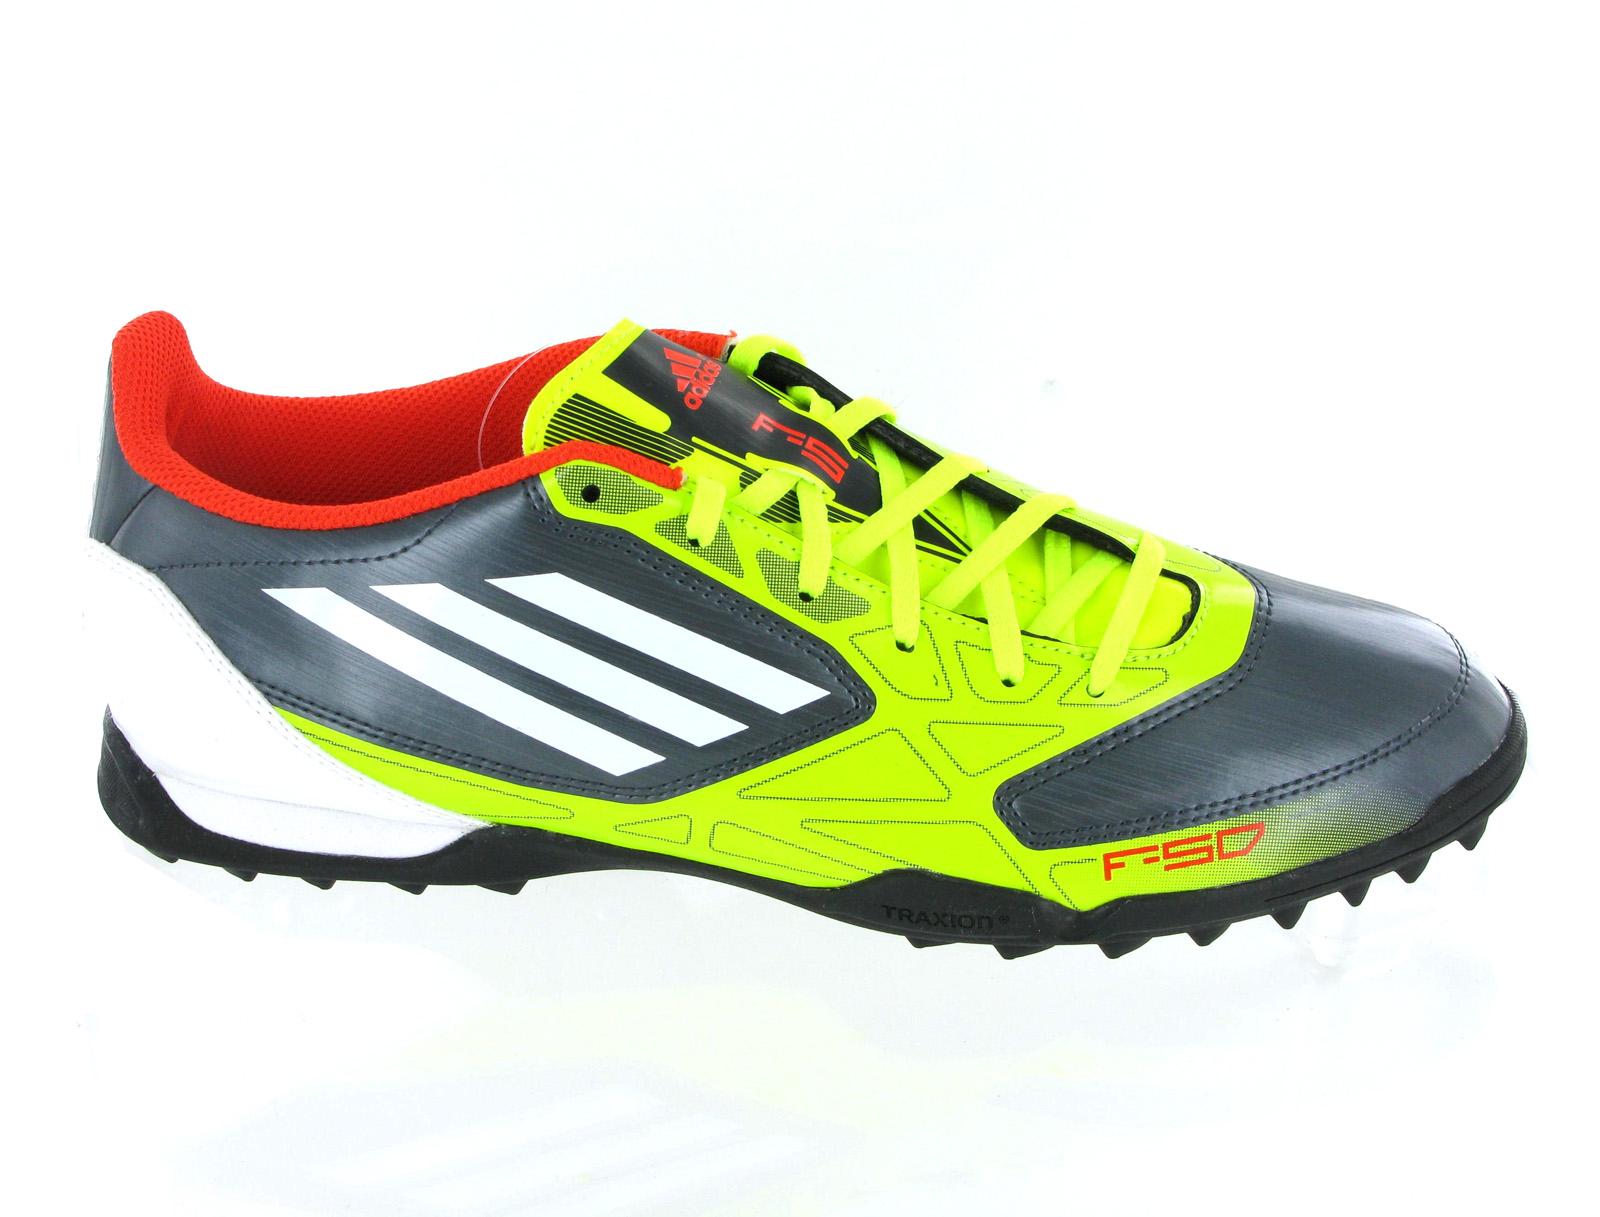 new mens adidas f5 trx tf black astro turf football boots size 6 12 uk rrp 163 50 ebay